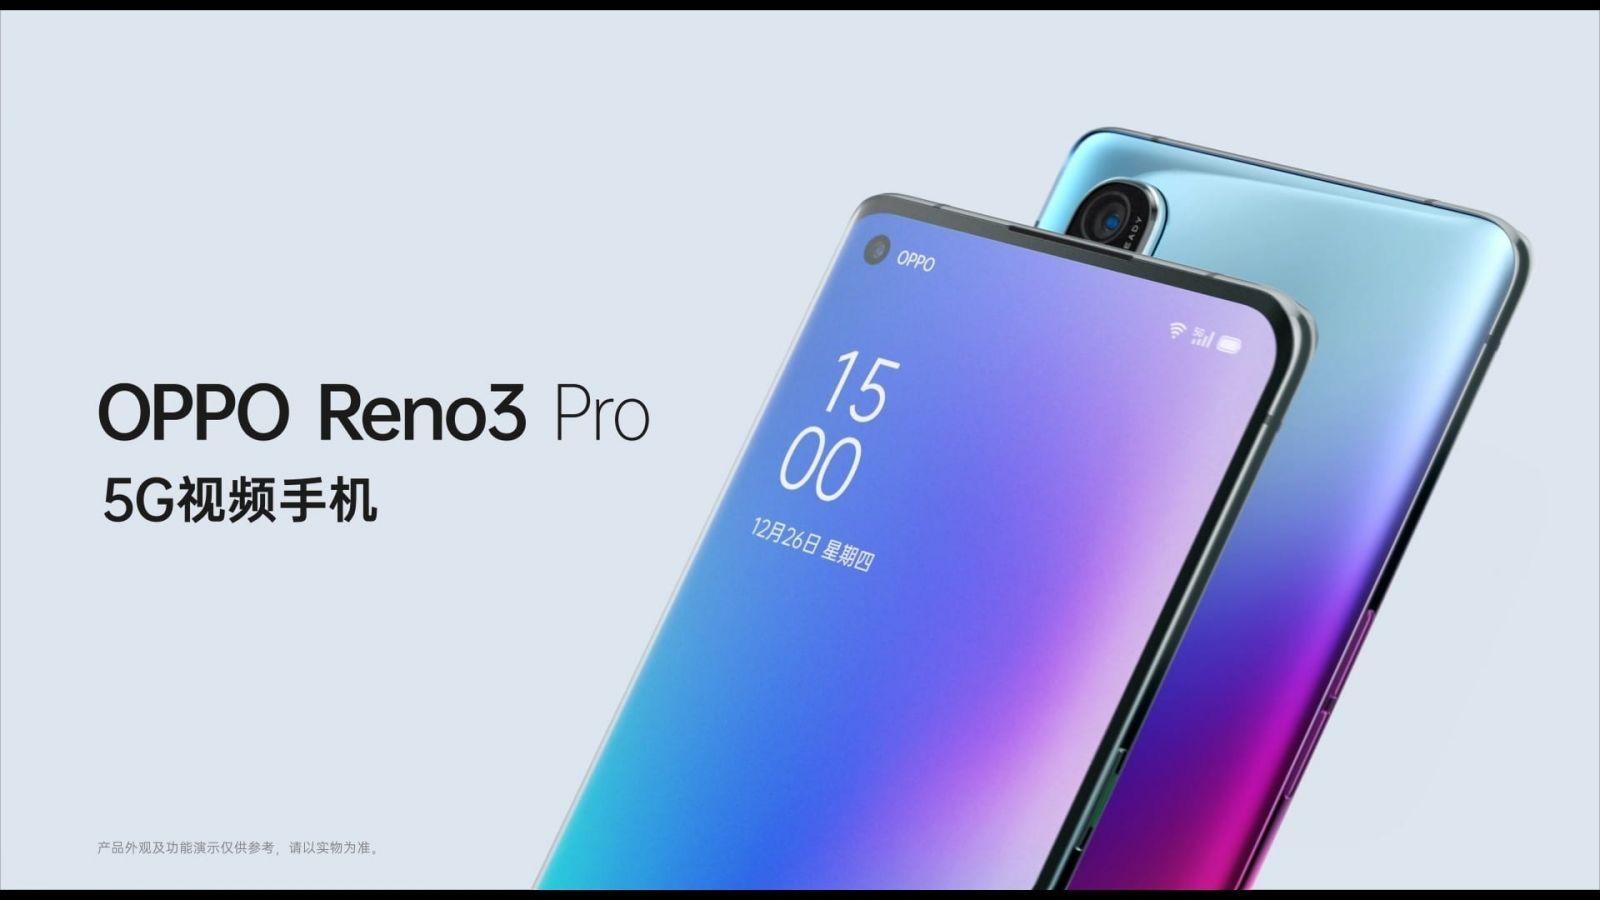 Раскрыты характеристики самого тонкого 5G-смартфона в мире - Oppo Reno3 Pro 5G (bez nazvanija 1)